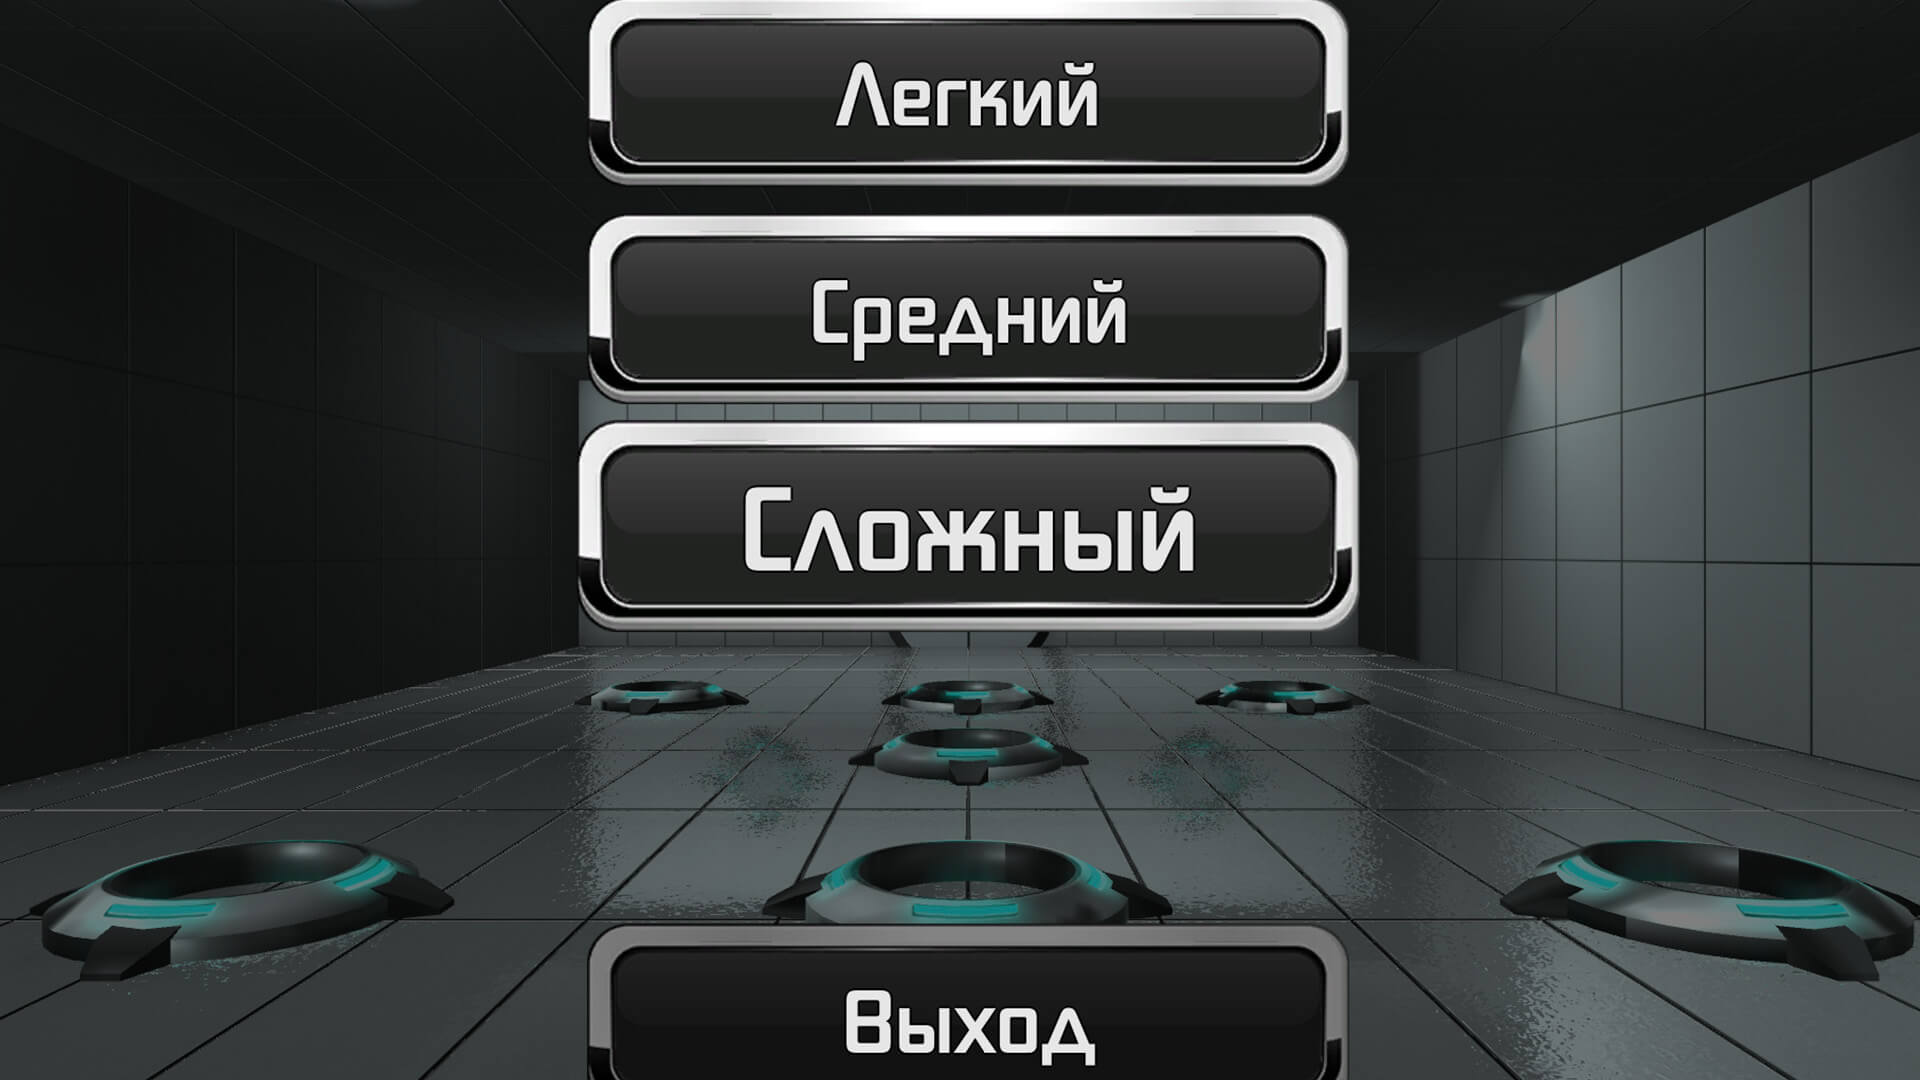 ПО для бизнеса 2 ТИР Электрон